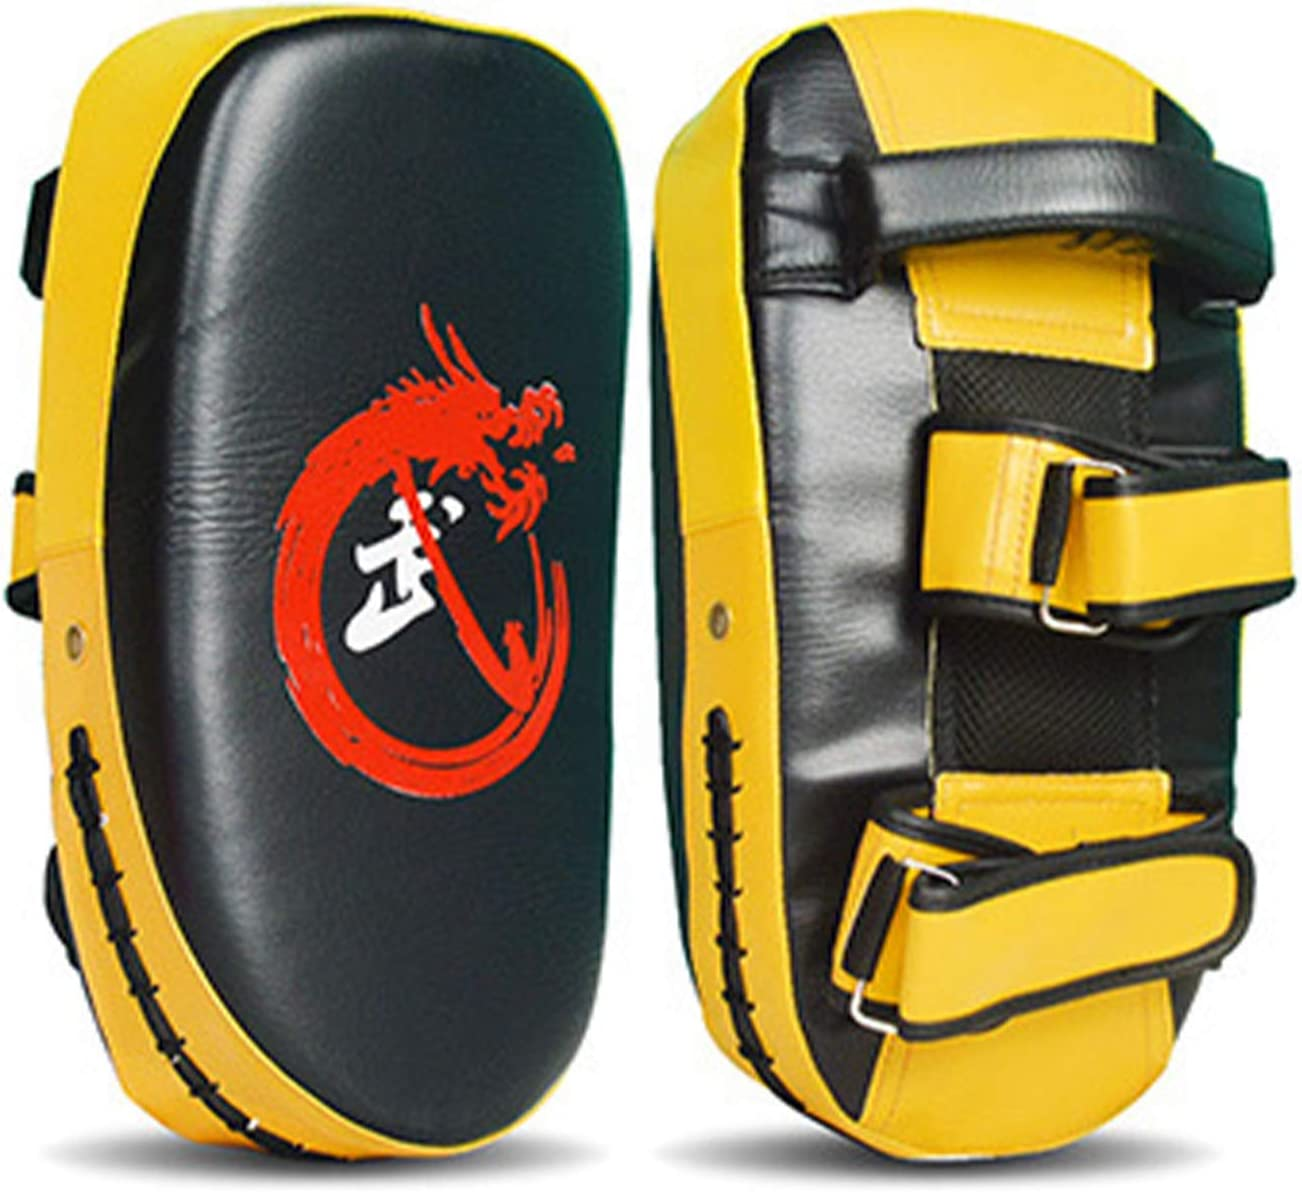 36x19x9cm Boxpratzen Handpratzen Schlagpolster Kickboxen MMA Pratzen Kampfsport EYLIFE 2PCS Box Pratzen Boxen Muay Thai